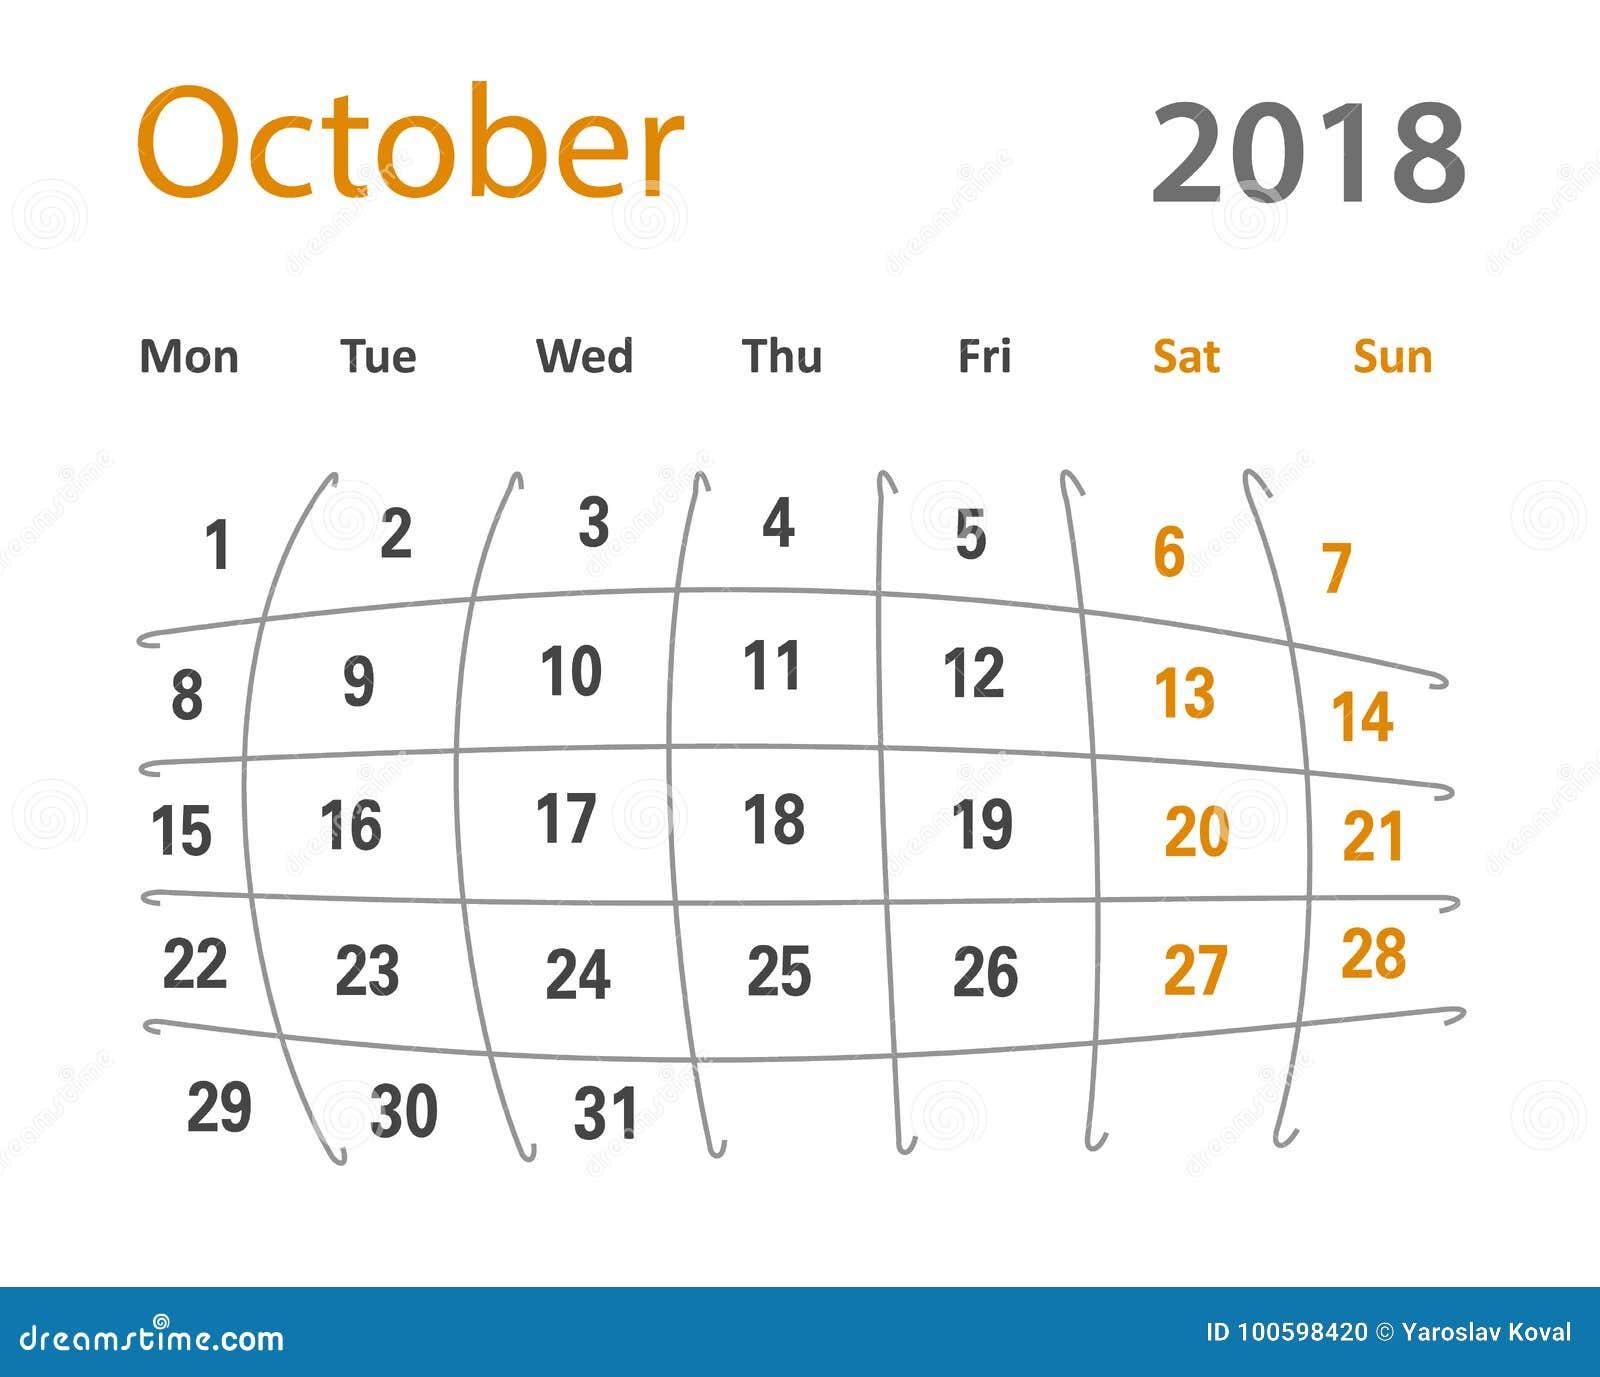 October Calendar Illustration : Funny original grid october creative calendar royalty